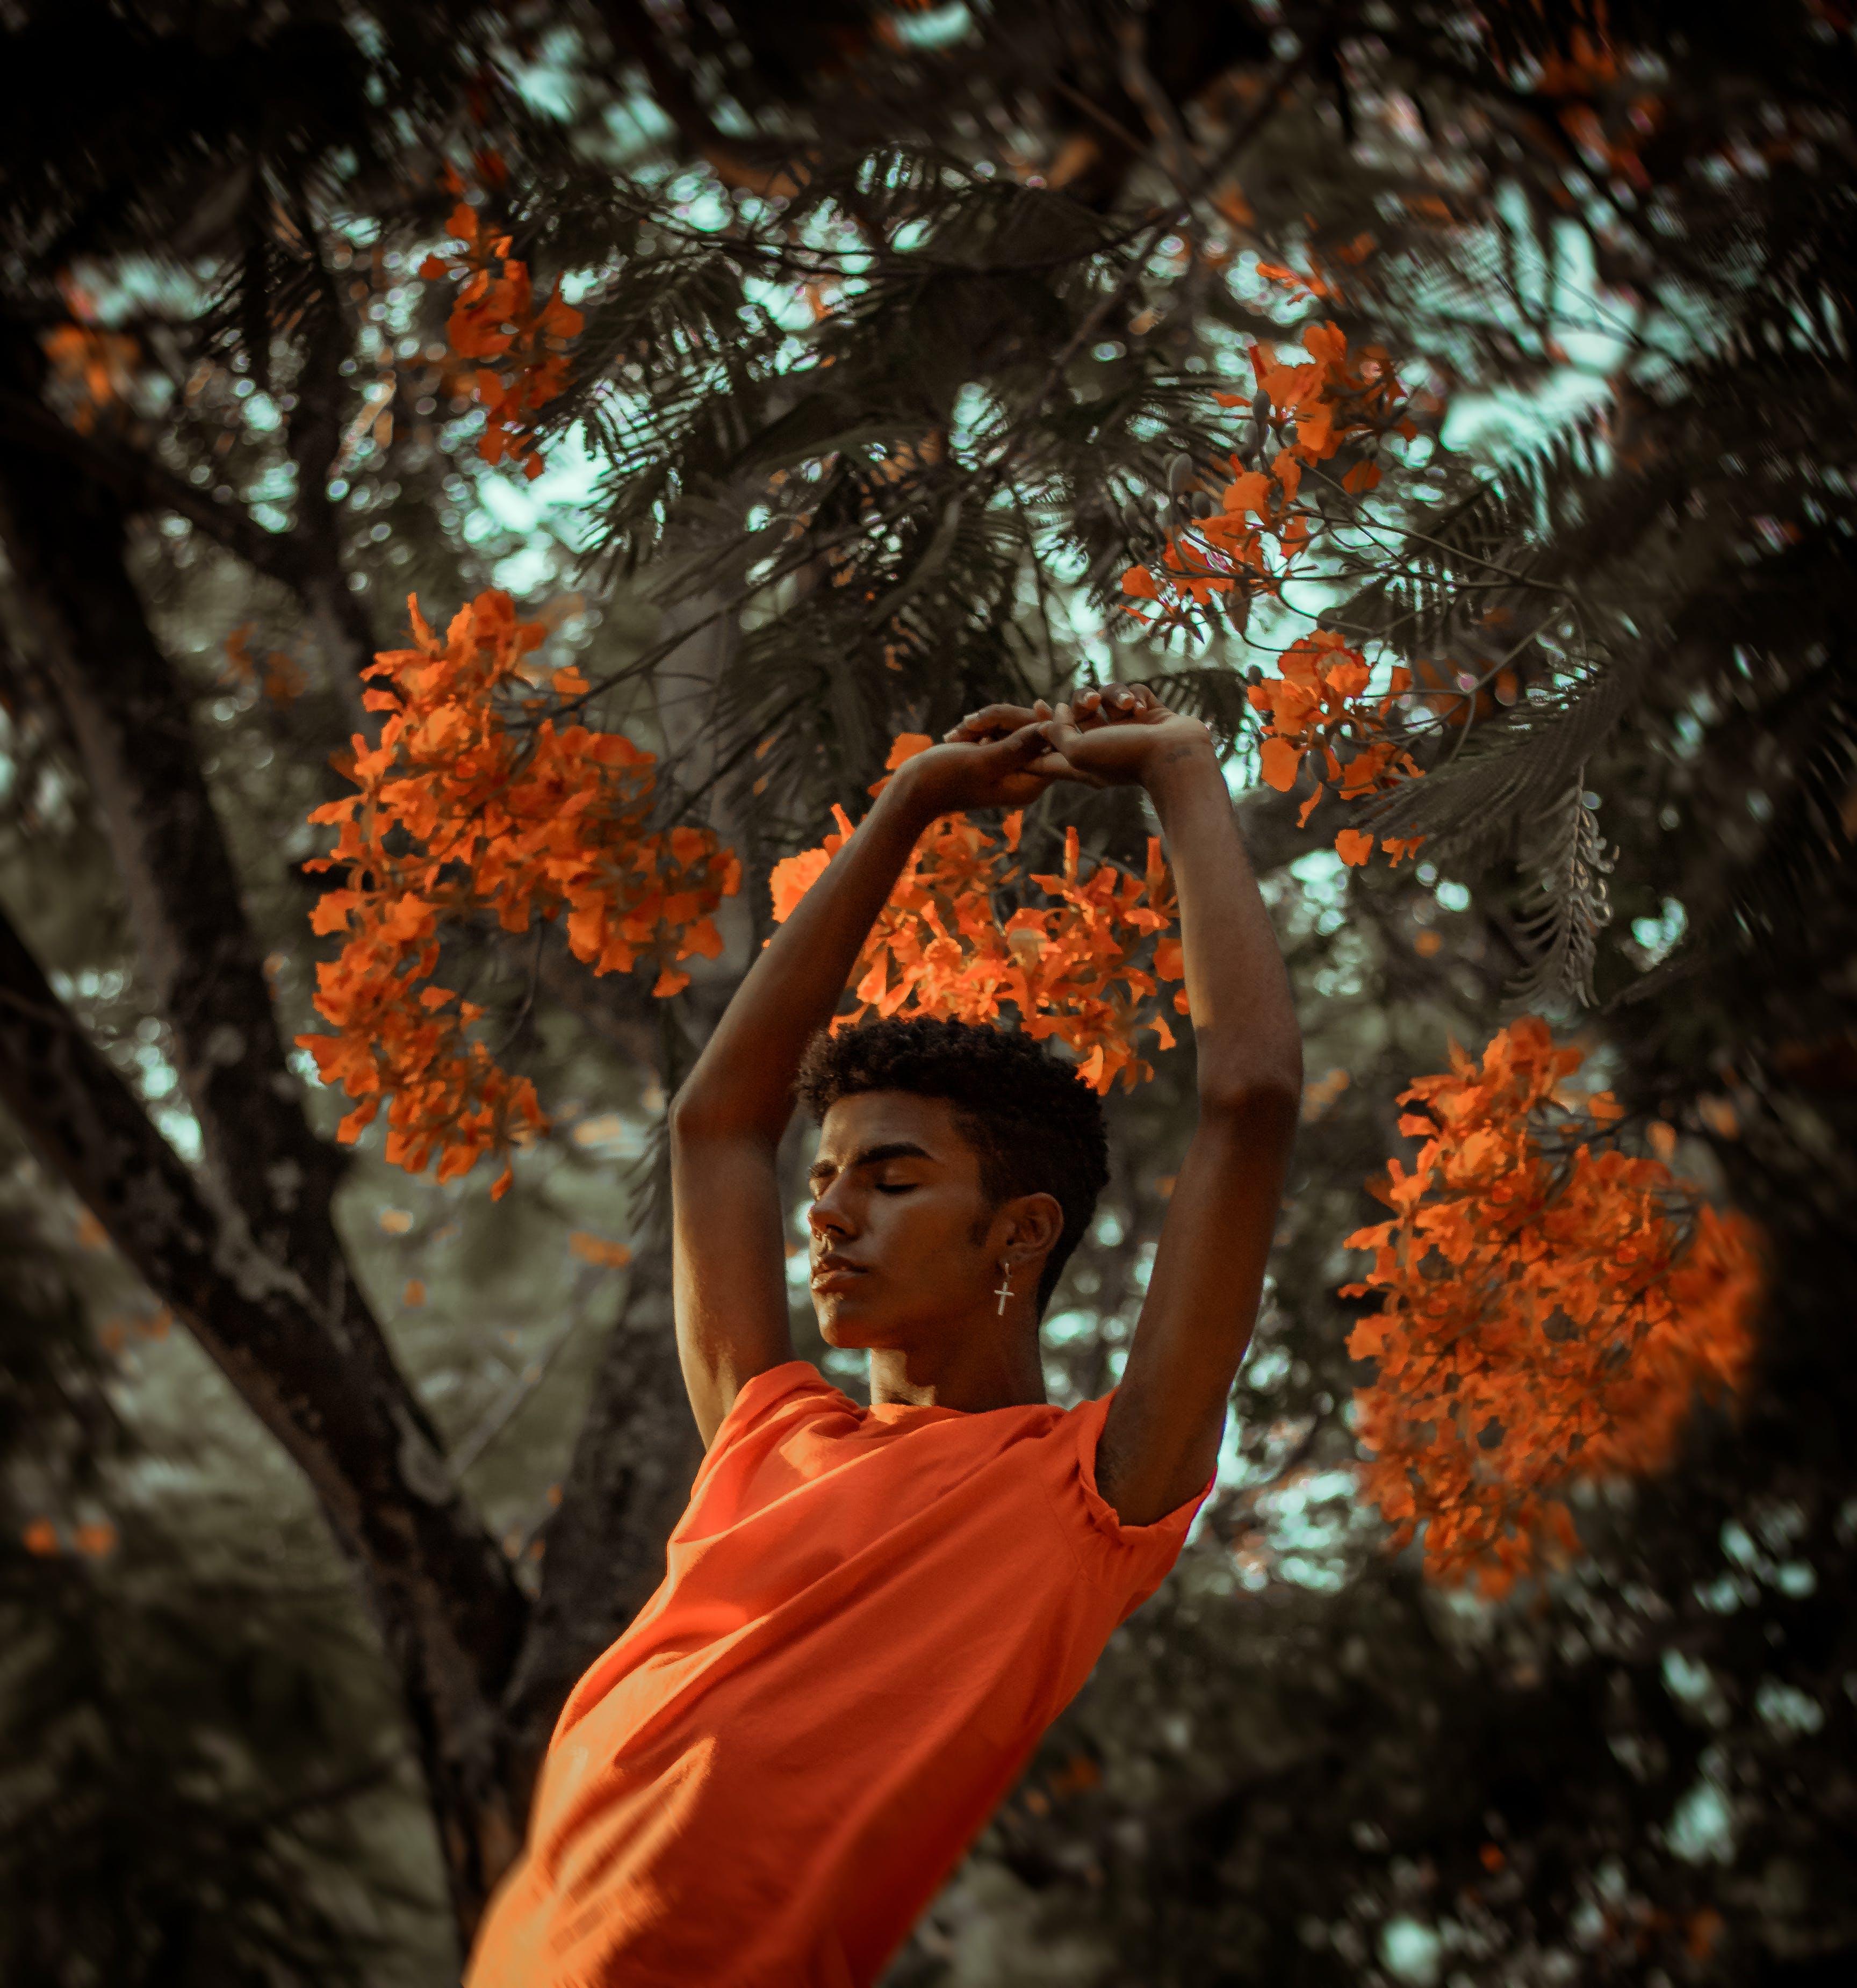 Shallow Focus Photo Of Man Stretching Near Orange Flowers